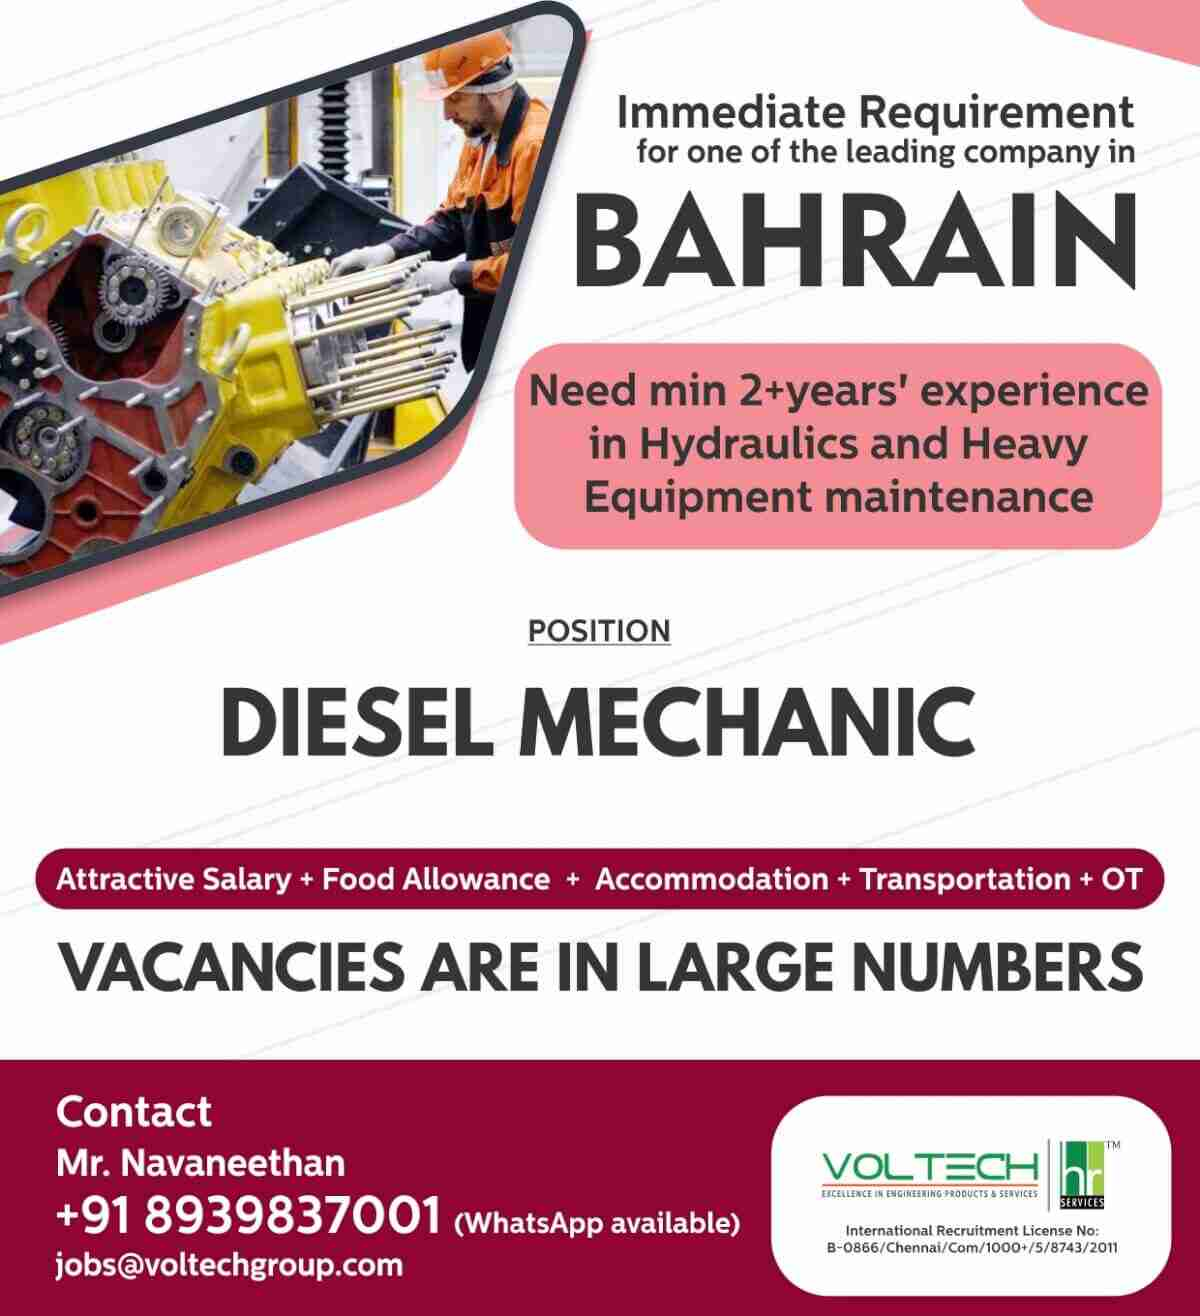 Gulf jobs mechanical – Large job vacancies in Bahrain